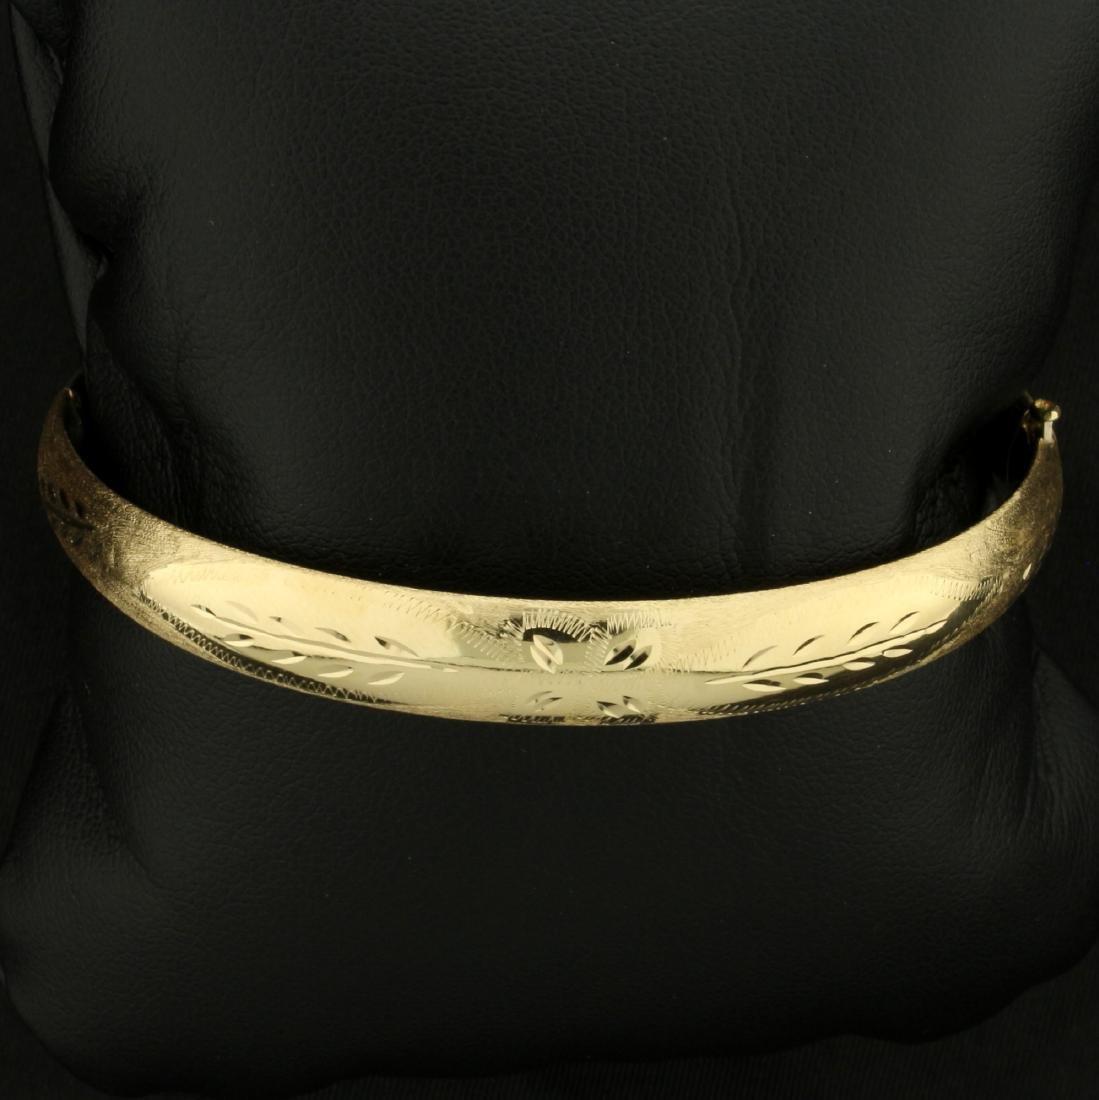 Diamond Cut Floral Design Bangle Bracelet in 14K Yellow